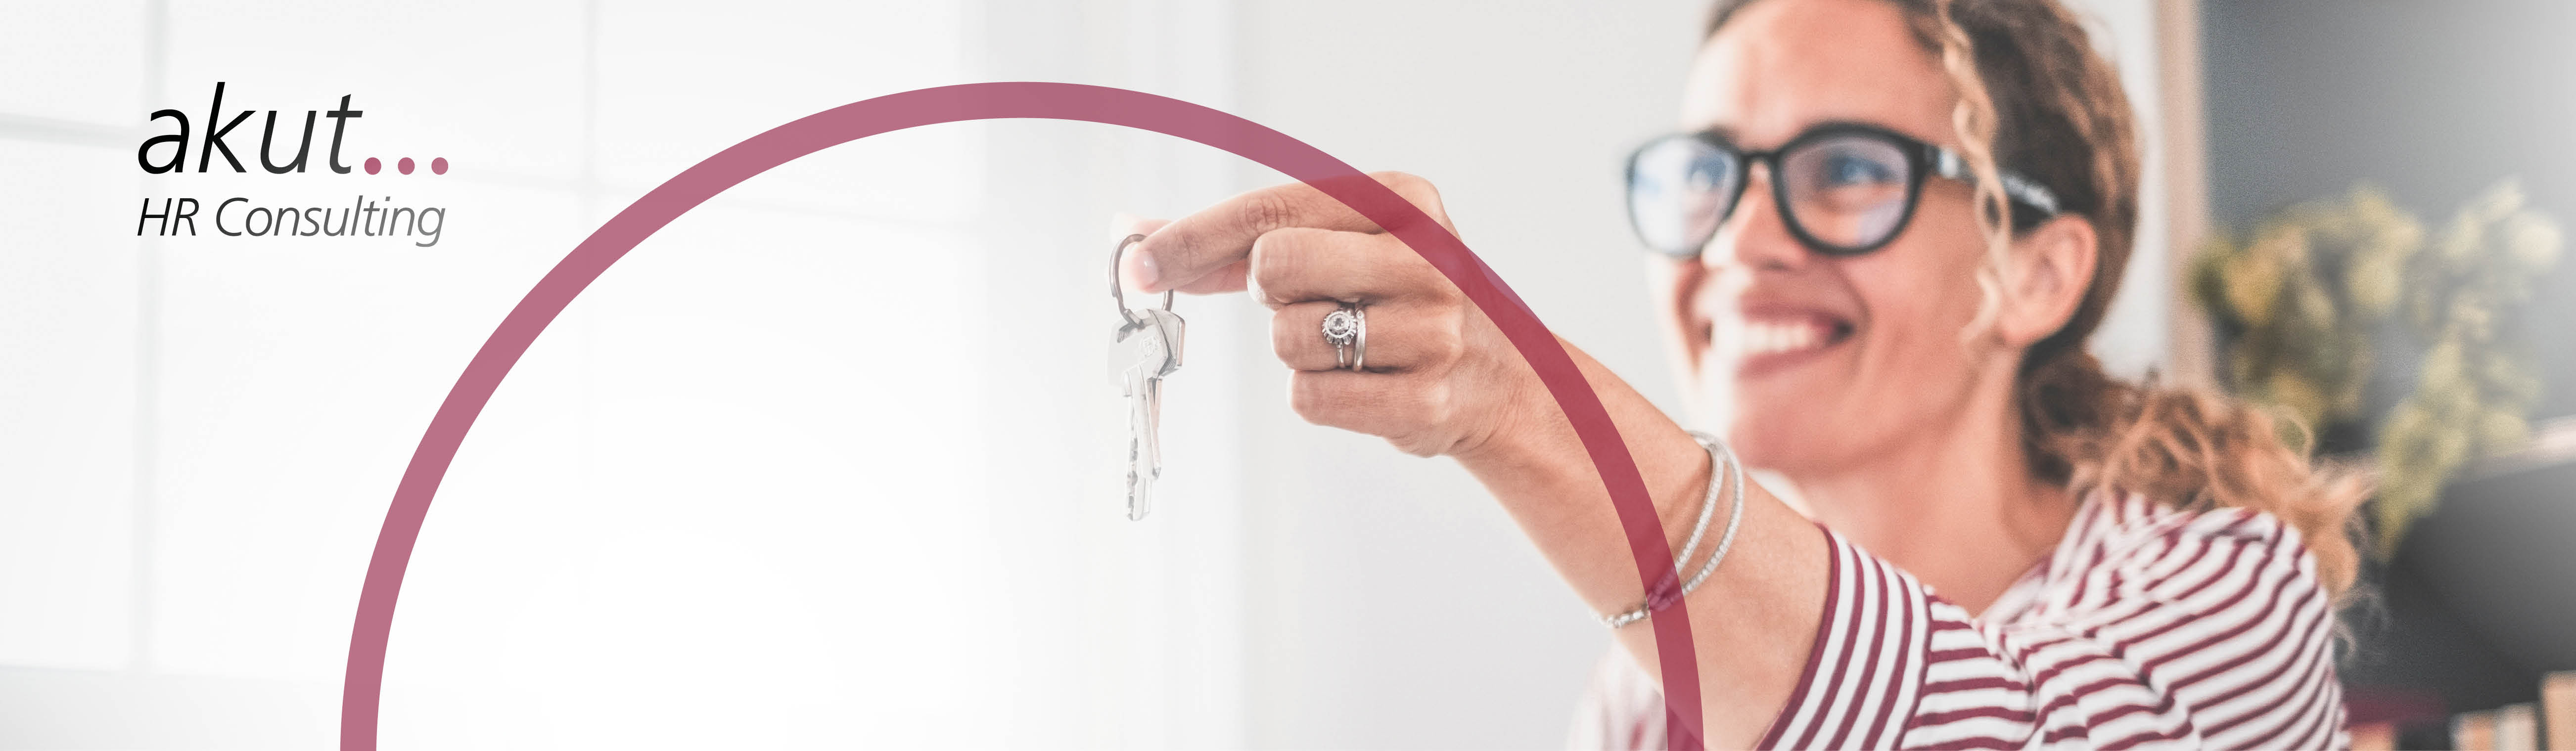 akut... HR Consulting GmbH - Stellenangebote